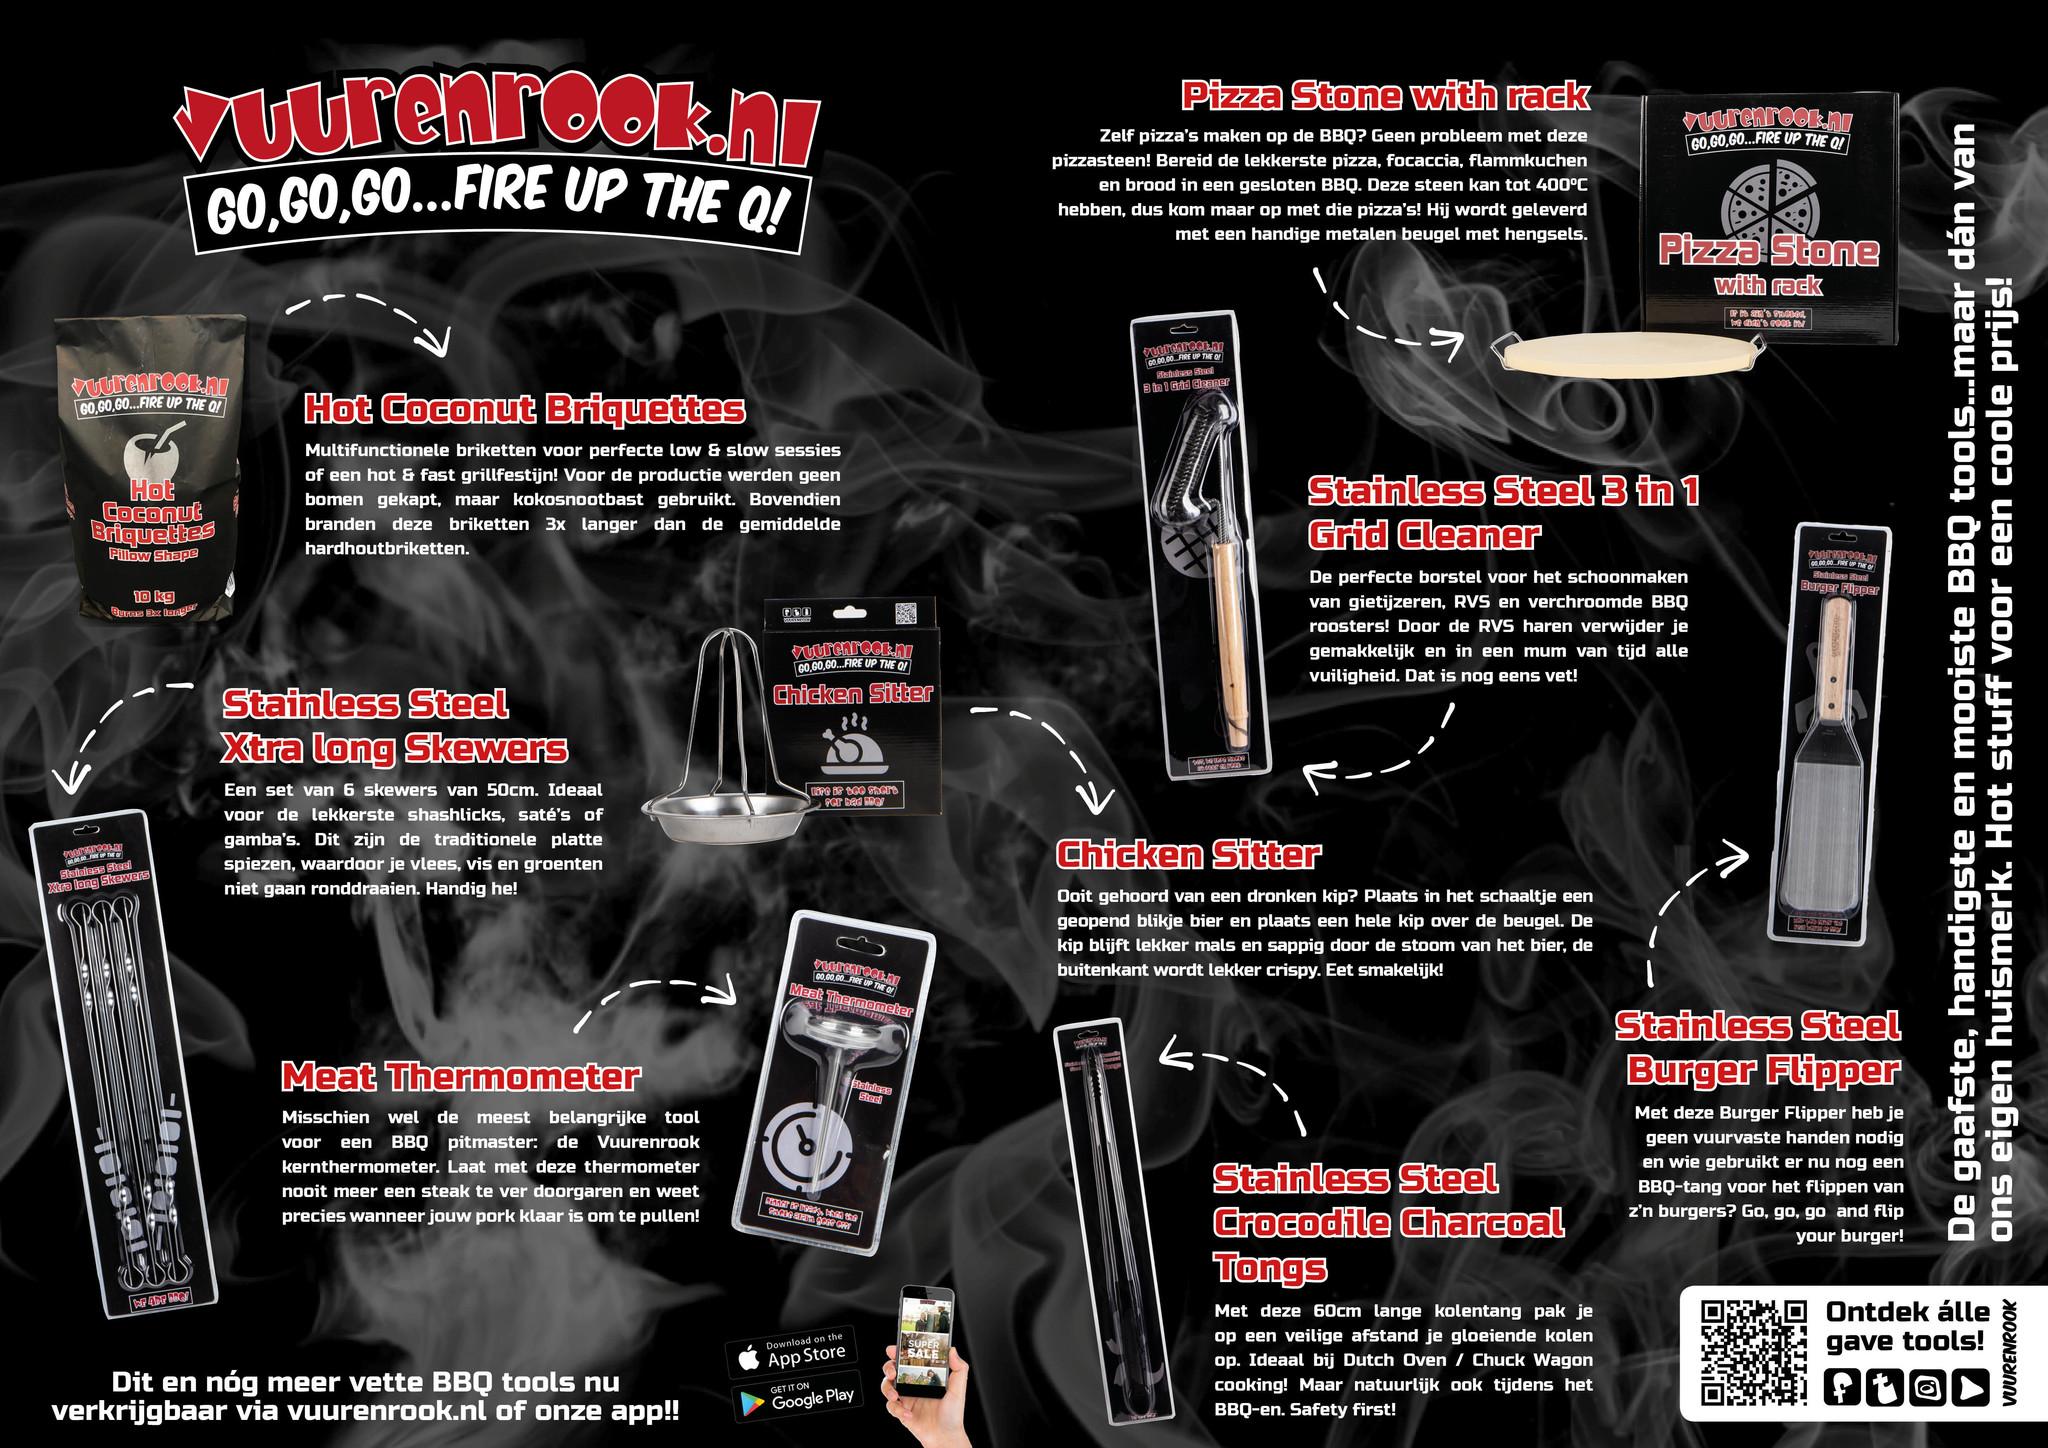 Vuur&Rook Vuur&Rook Pull Your Pork Deal